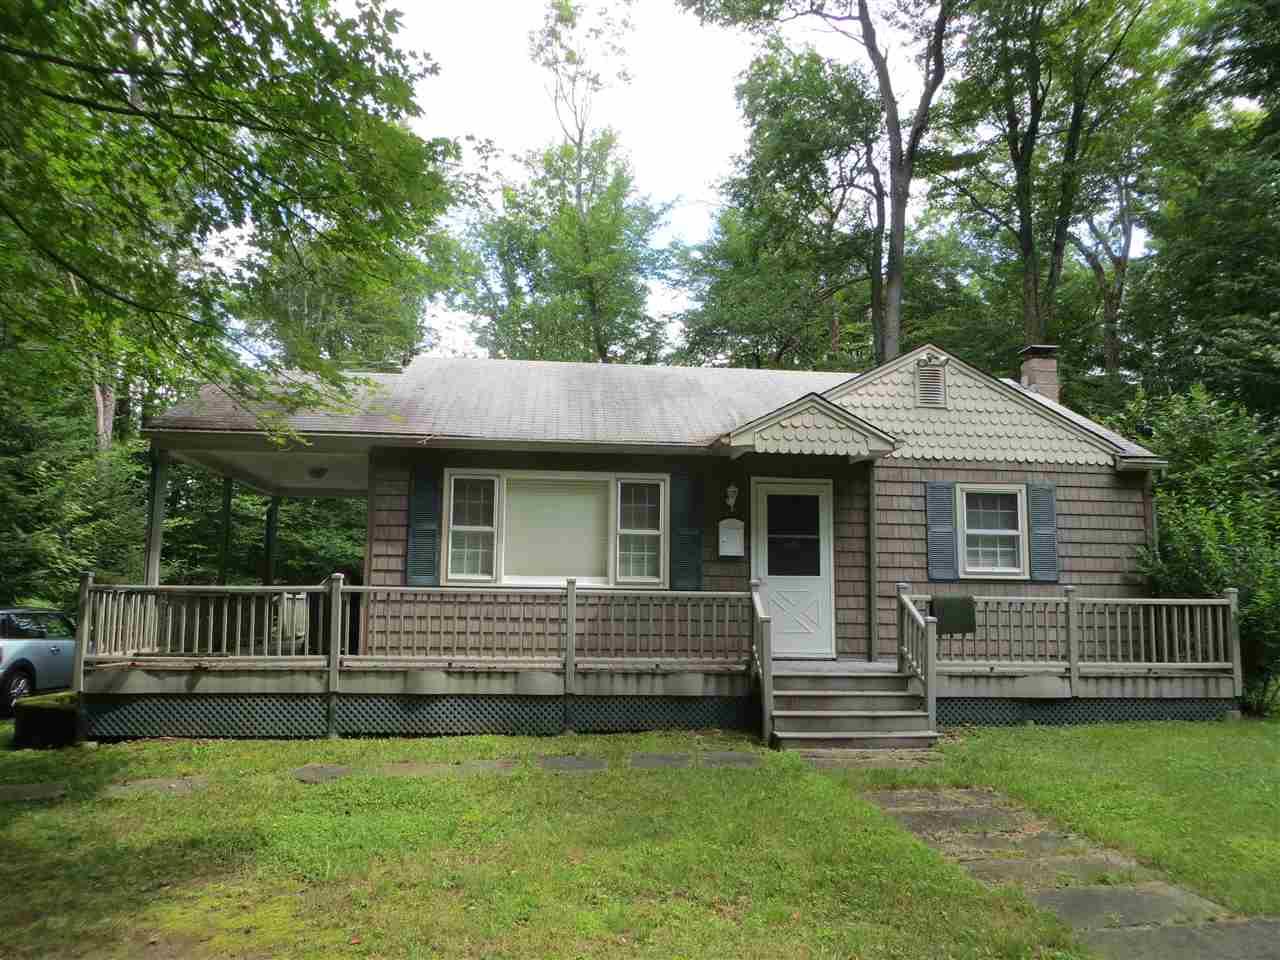 Real Estate for Sale, ListingId: 34989568, Livingston Manor,NY12758